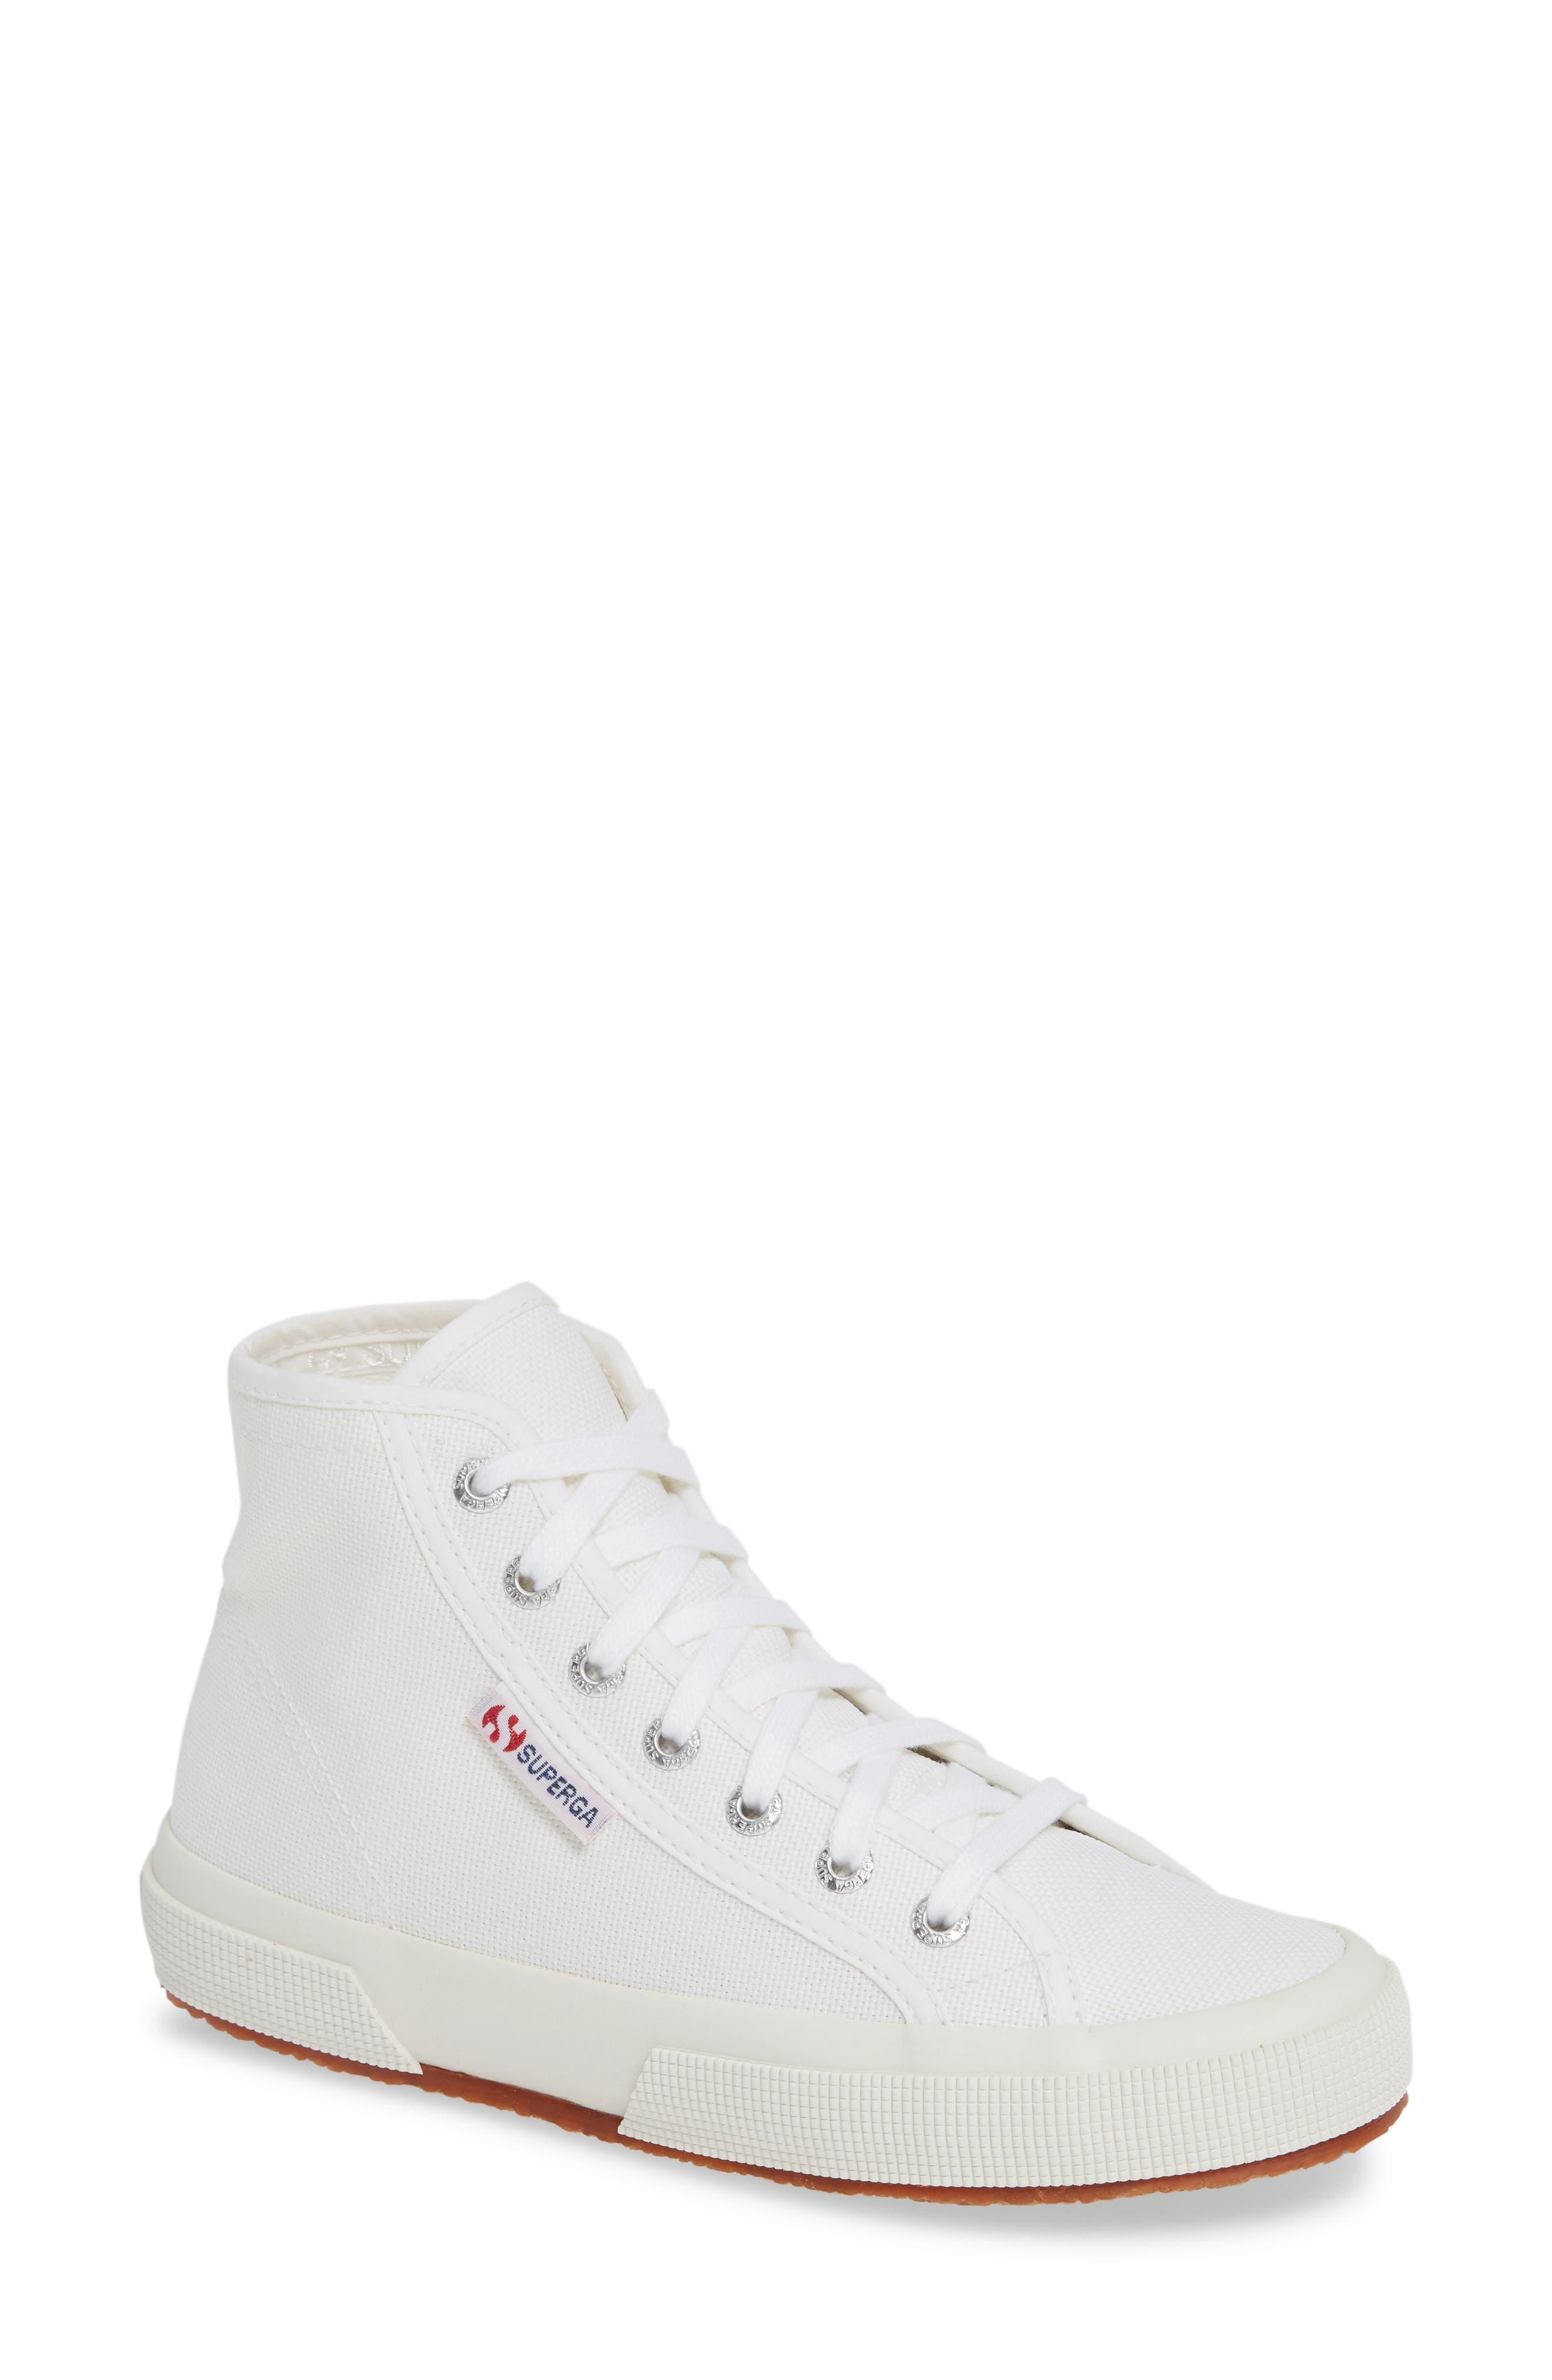 2795 High Top Sneaker,                             Main thumbnail 1, color,                             WHITE